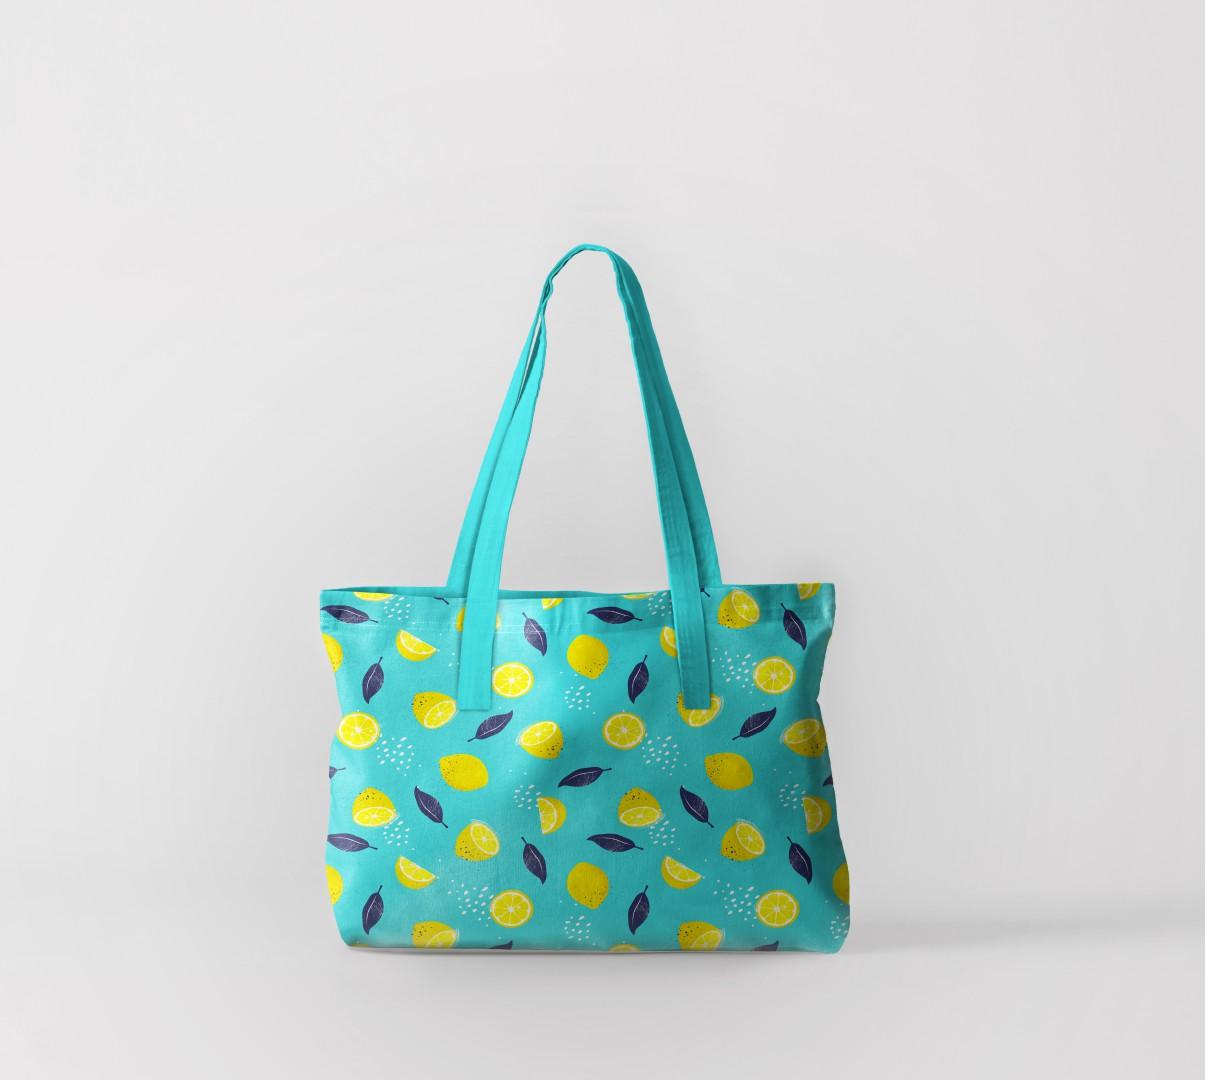 Пляжная сумка Лимоны и листья (50х40 см) Олимп Текстиль oli732577